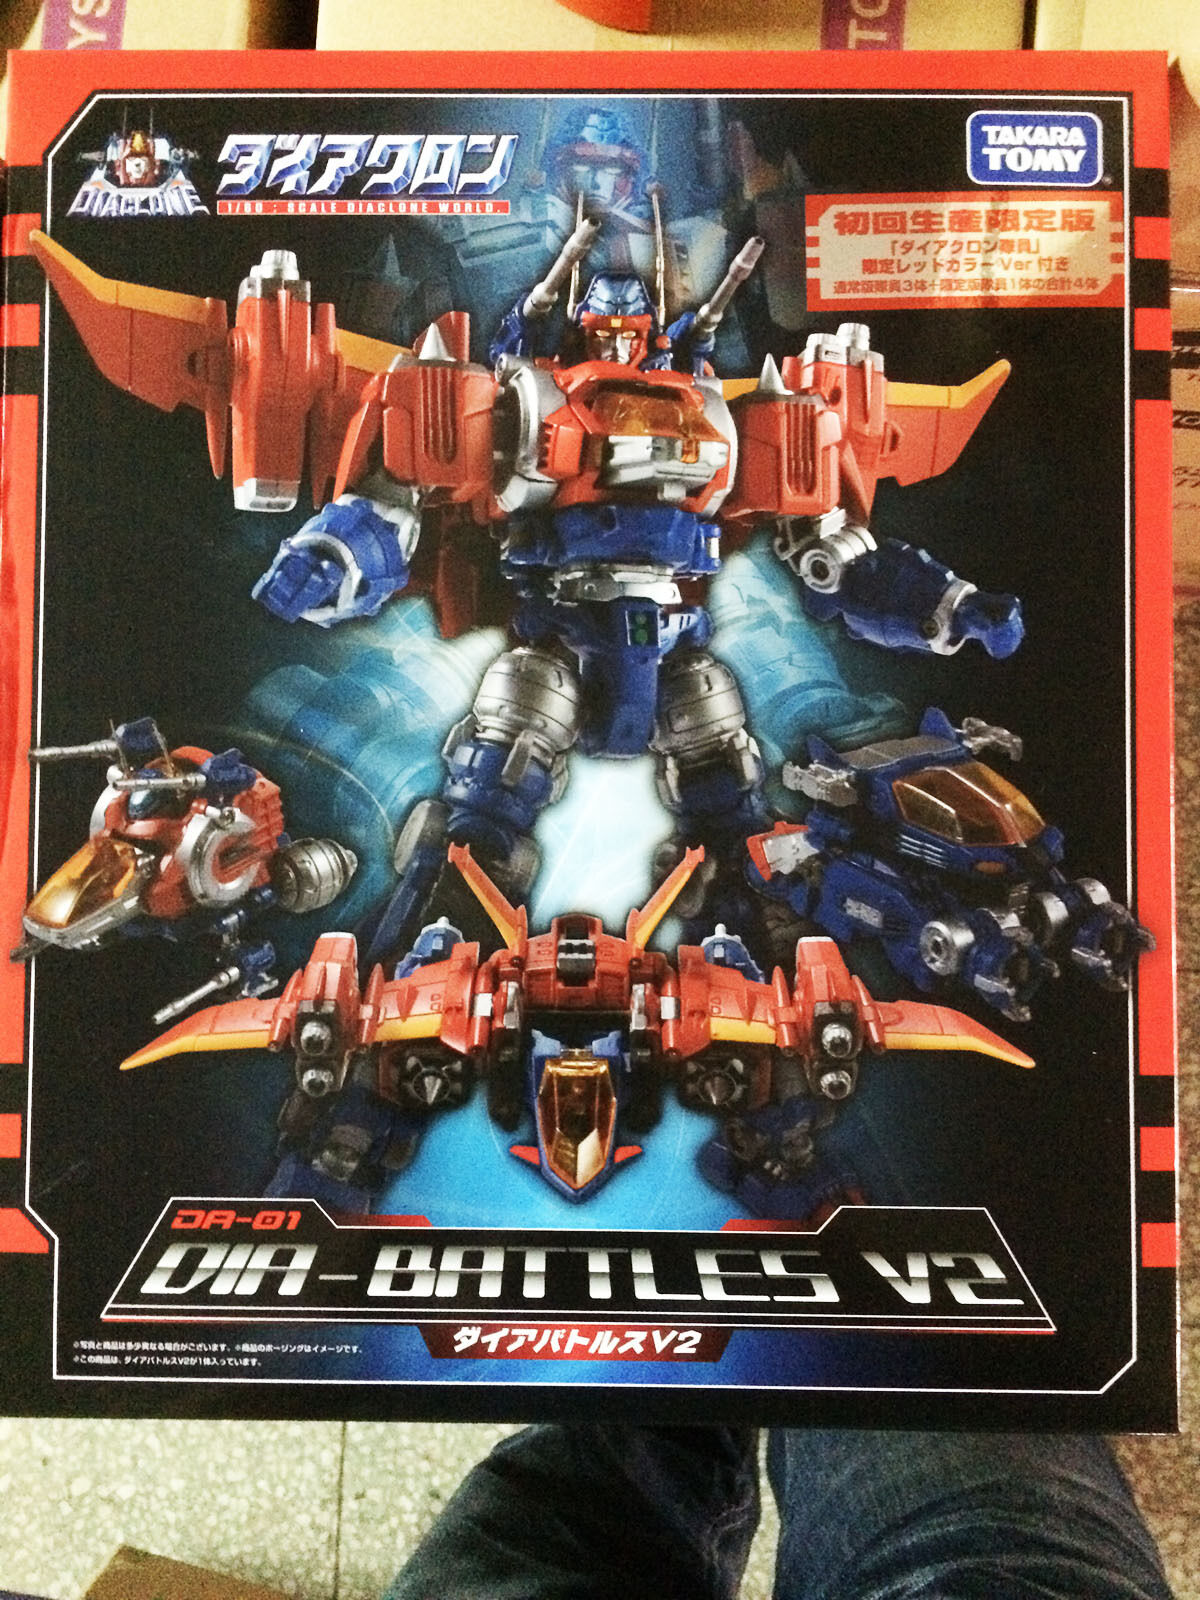 Clearance Clearance Clearance Transformers Takara Tokyo Show Diaclone Dia battles V2 DA-01 Limited 491259